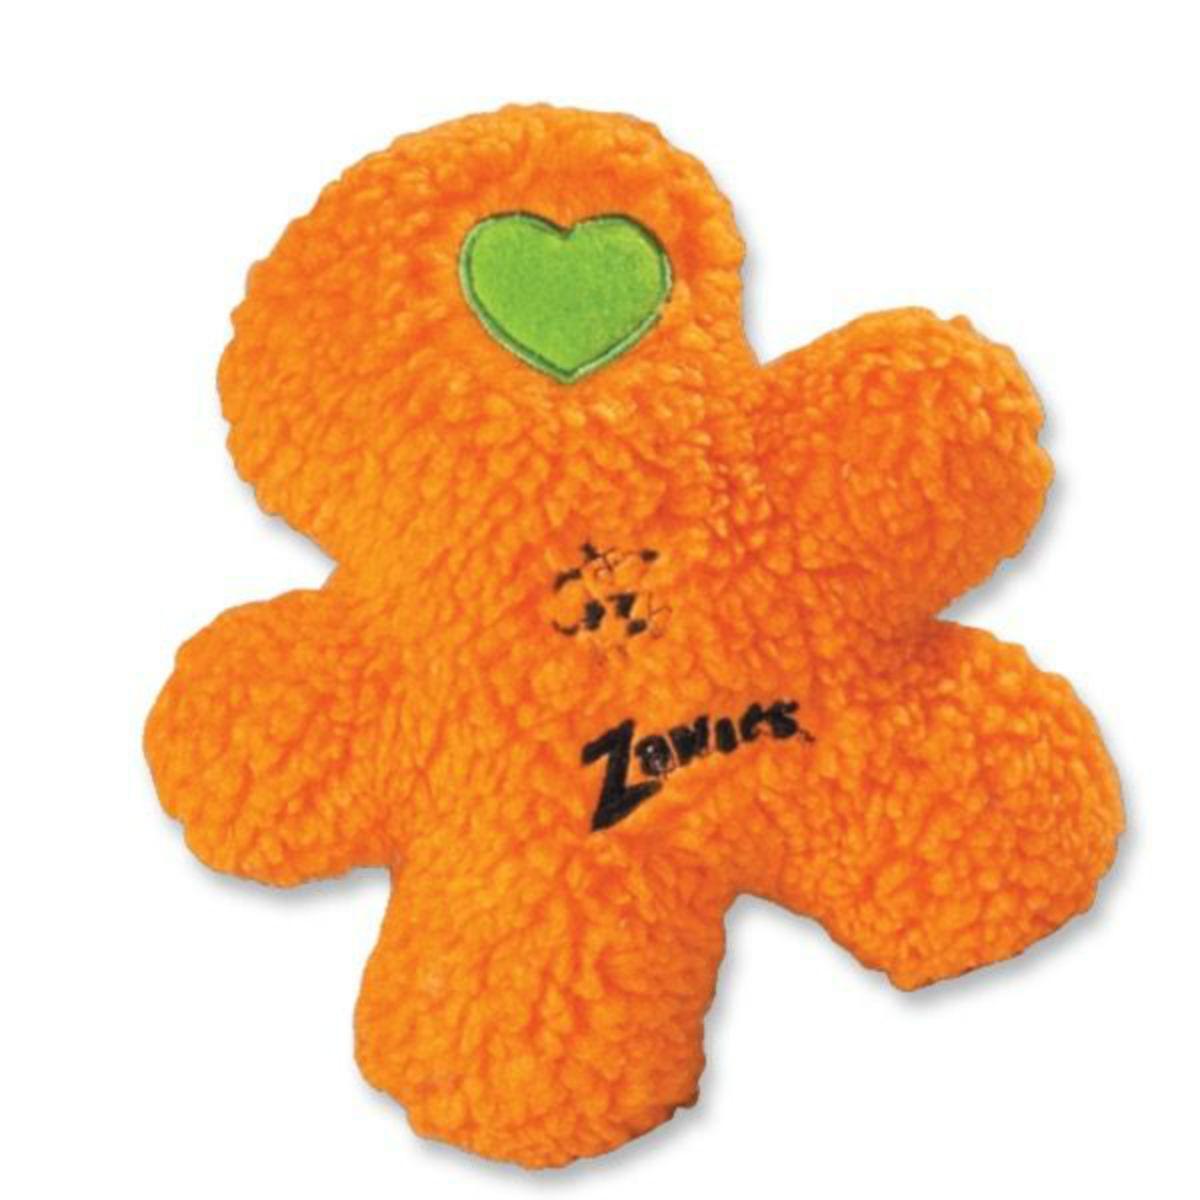 Zanies Embroidered Berber Boys Dog Toy - Orange